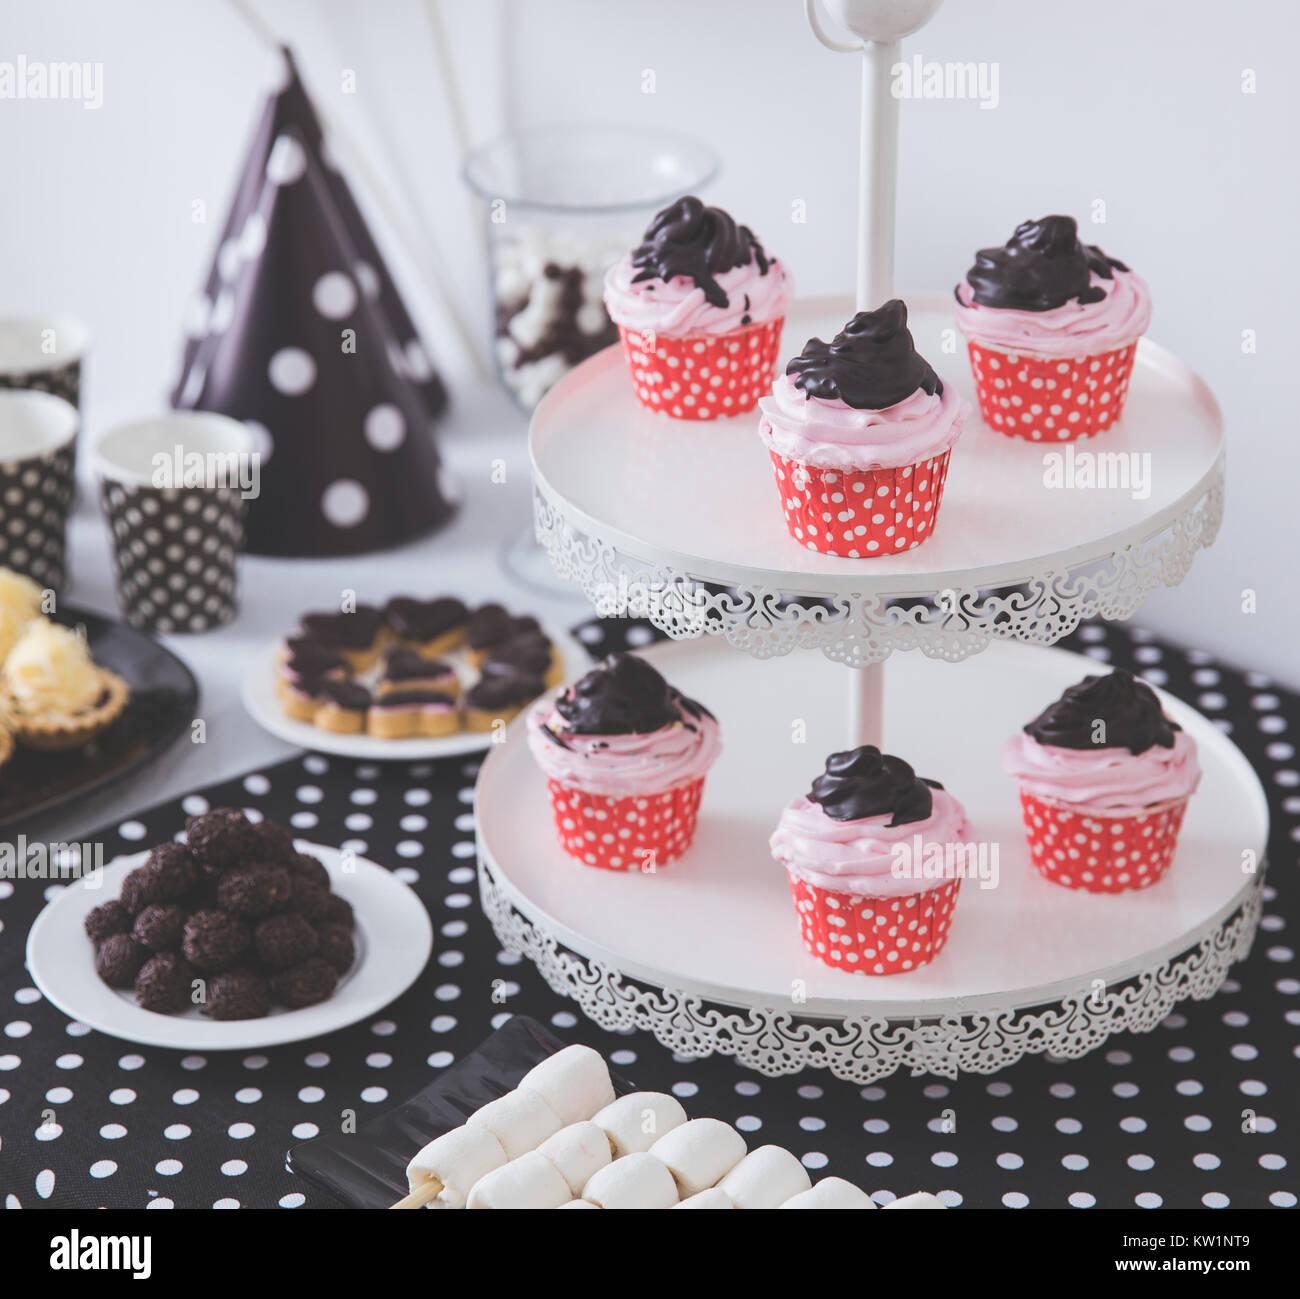 Black And White Birthday Party Decoration Stock Photo 170298809 Alamy